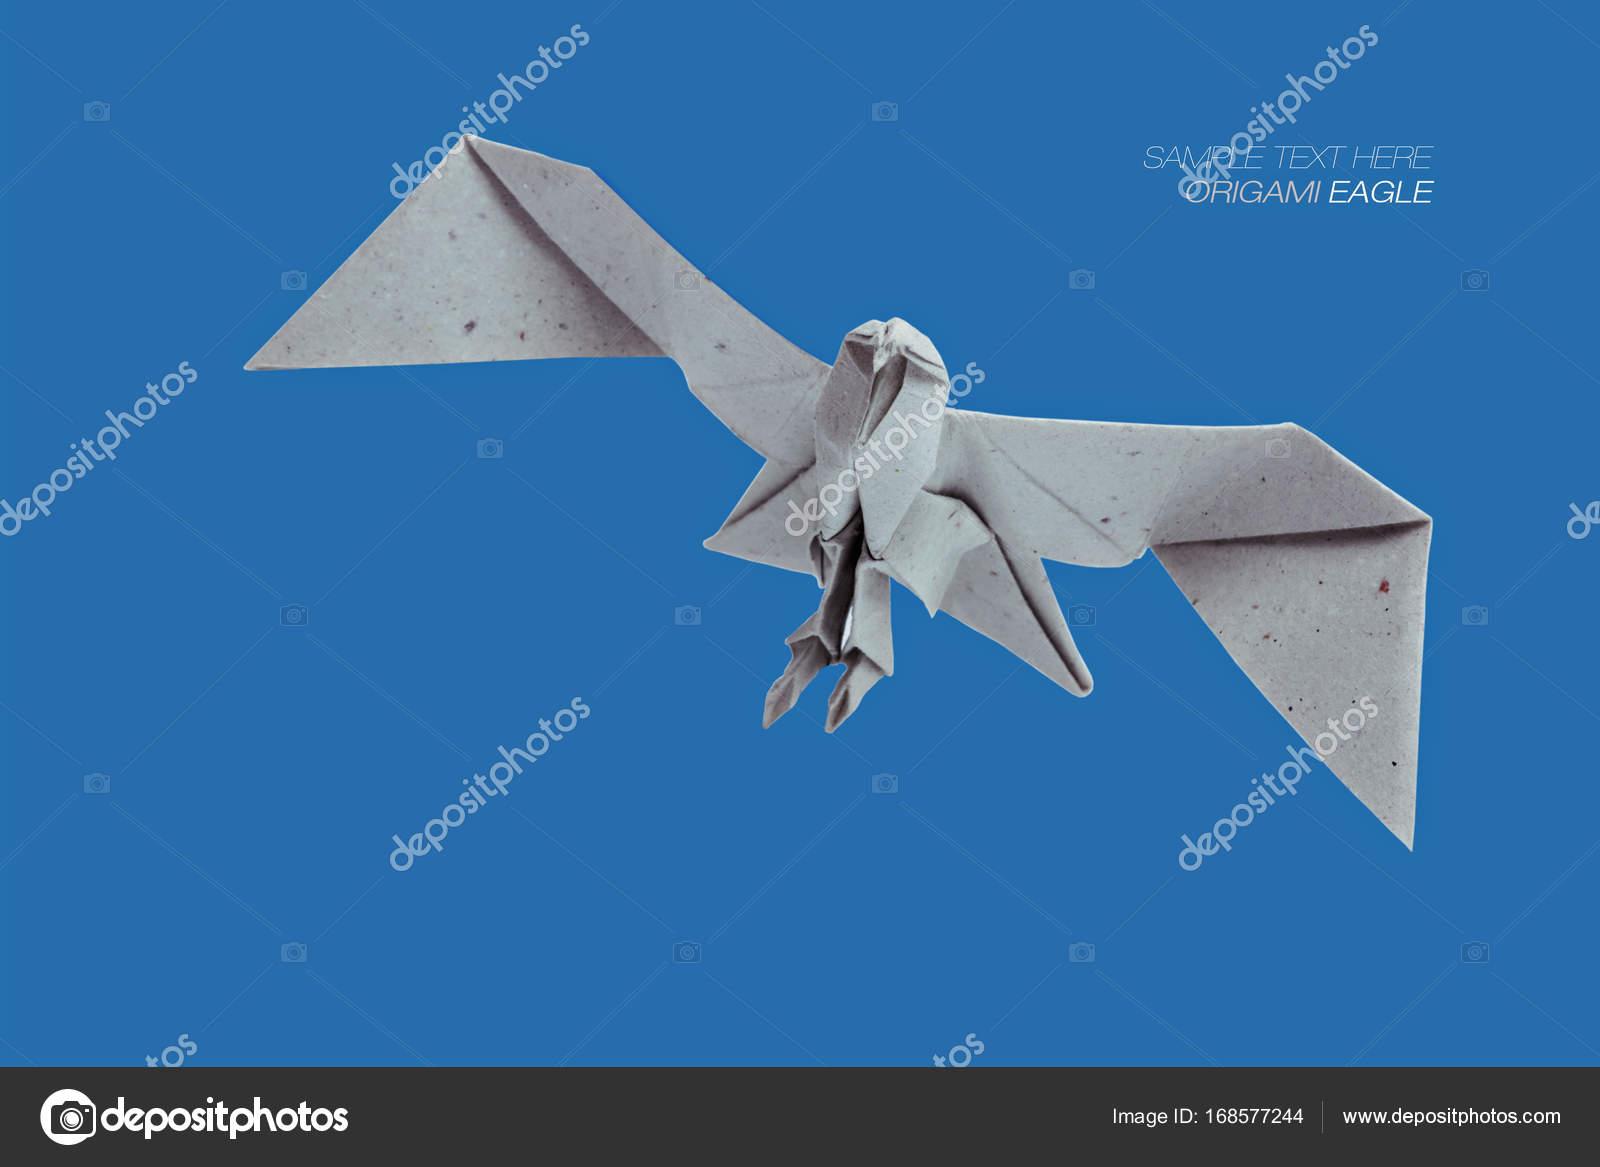 Paper Eagle, Easy Origami for Kids, Basic origami, Simple Origami for Be...  | Easy origami for kids, Origami eagle, Origami easy | 1167x1600